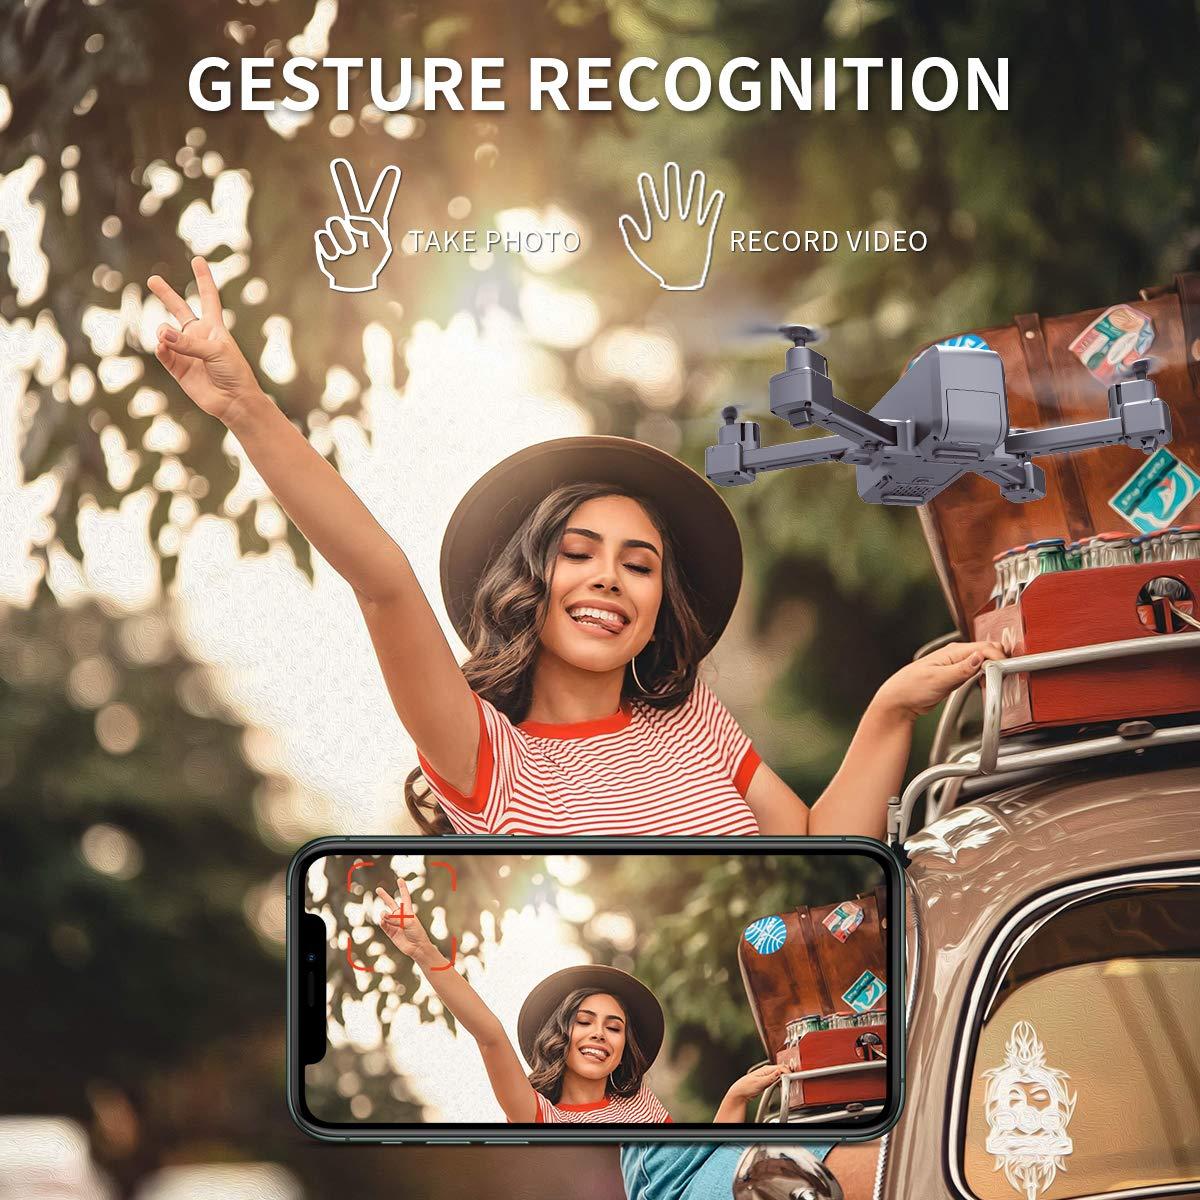 HR H5 Gesture Recognition